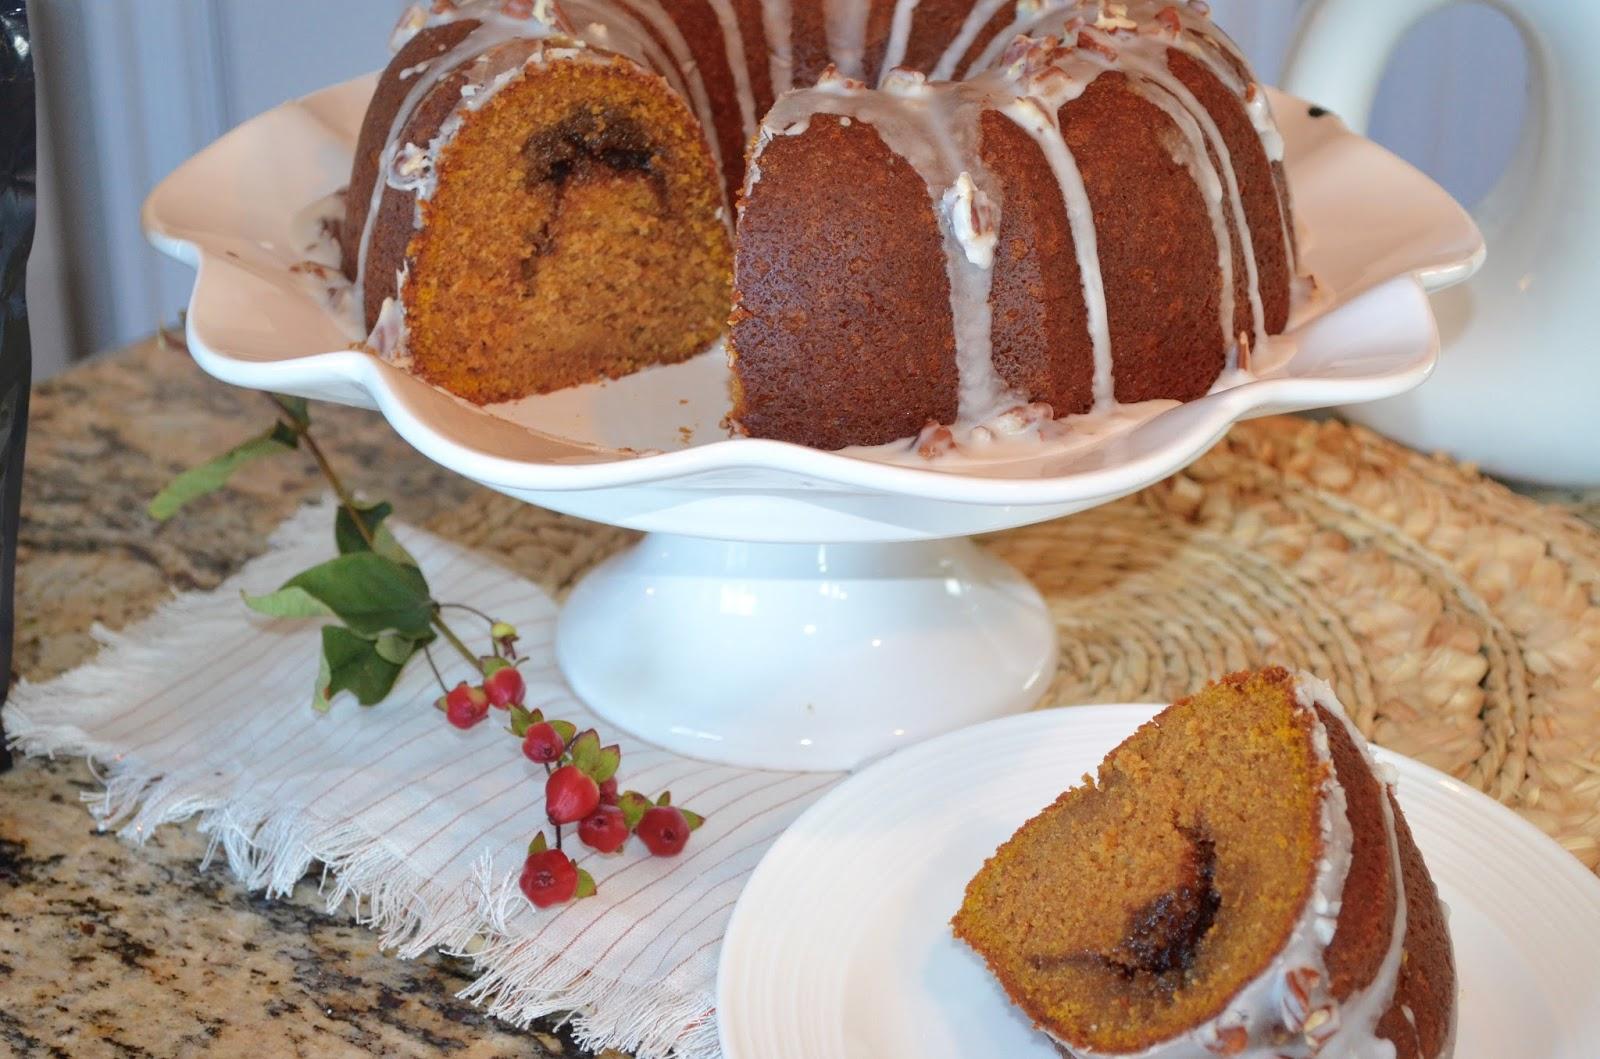 Pumpkin Bundt Cake with Brown Sugar Streusel